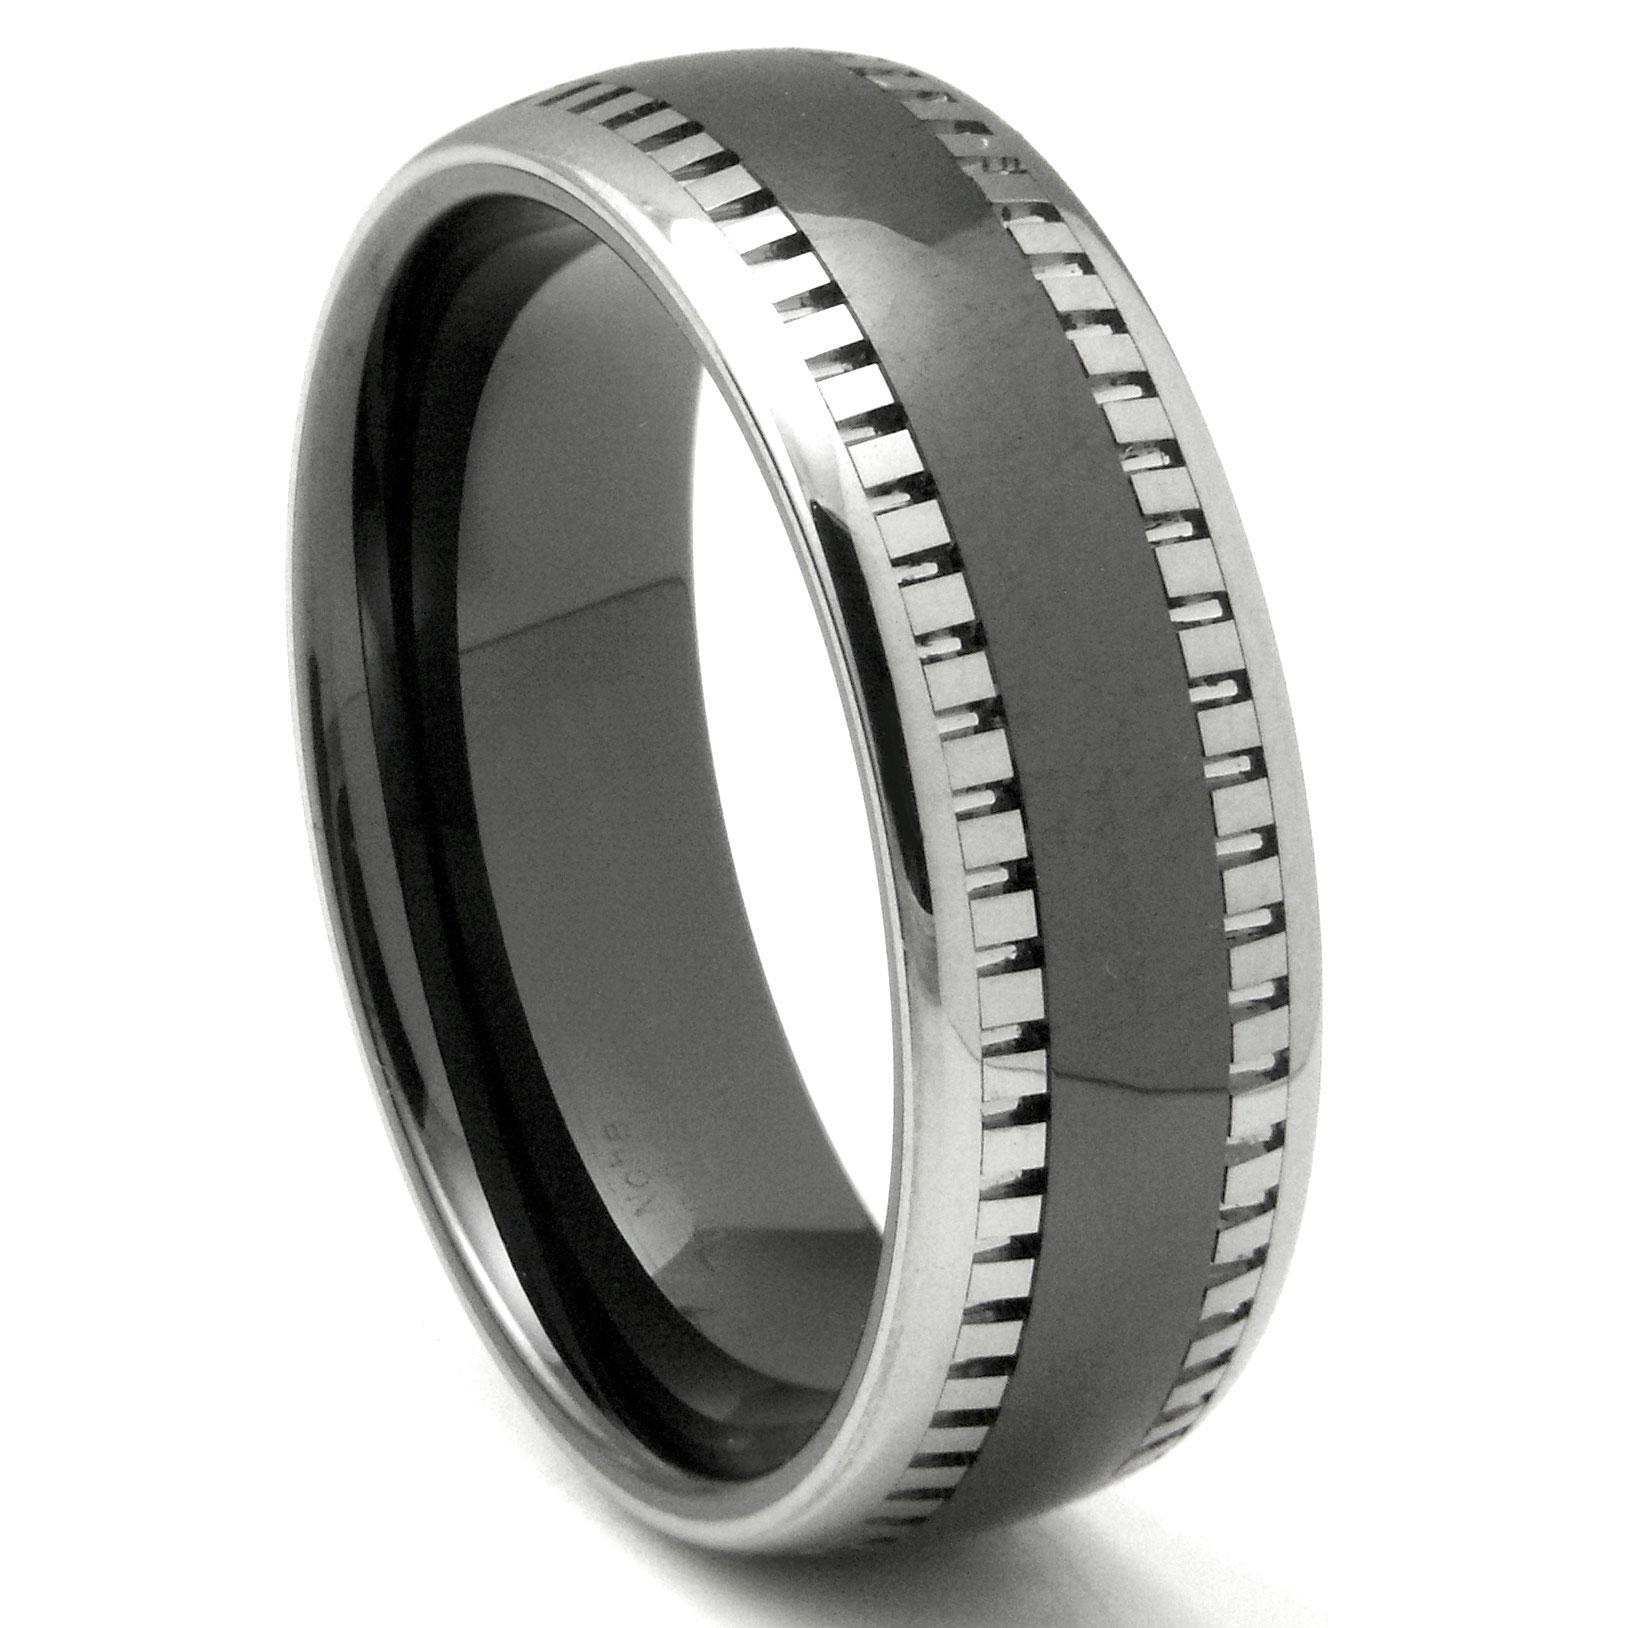 2nd Generation Tungsten Carbide Two Tone Milgrain Dome Wedding Band Ring P tungsten carbide wedding rings Home Men s Tungsten Carbide Rings Loading zoom